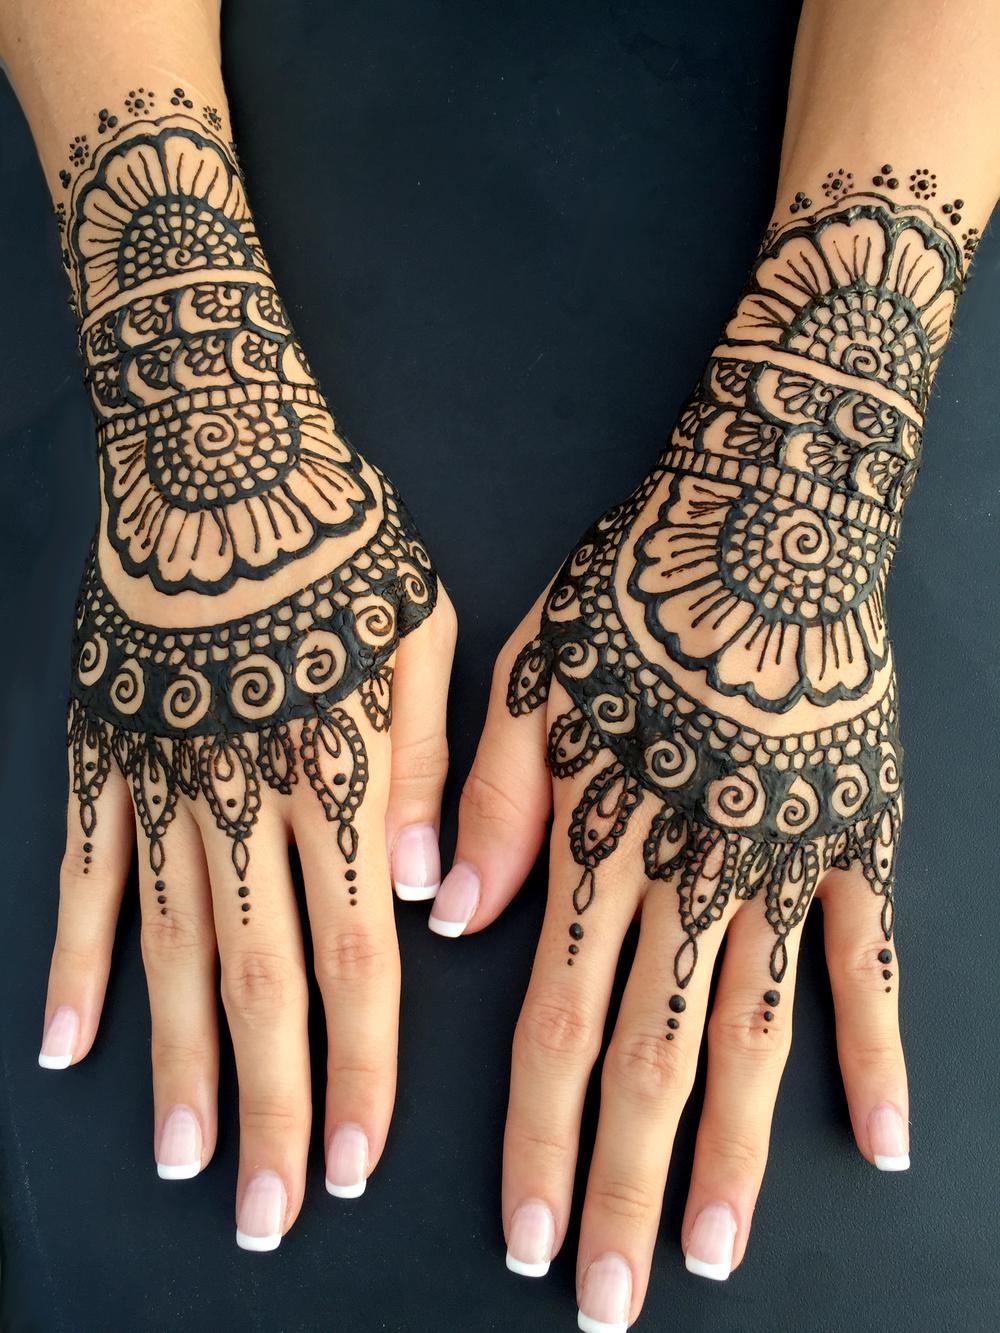 J u henna tattoo for How is a henna tattoo done